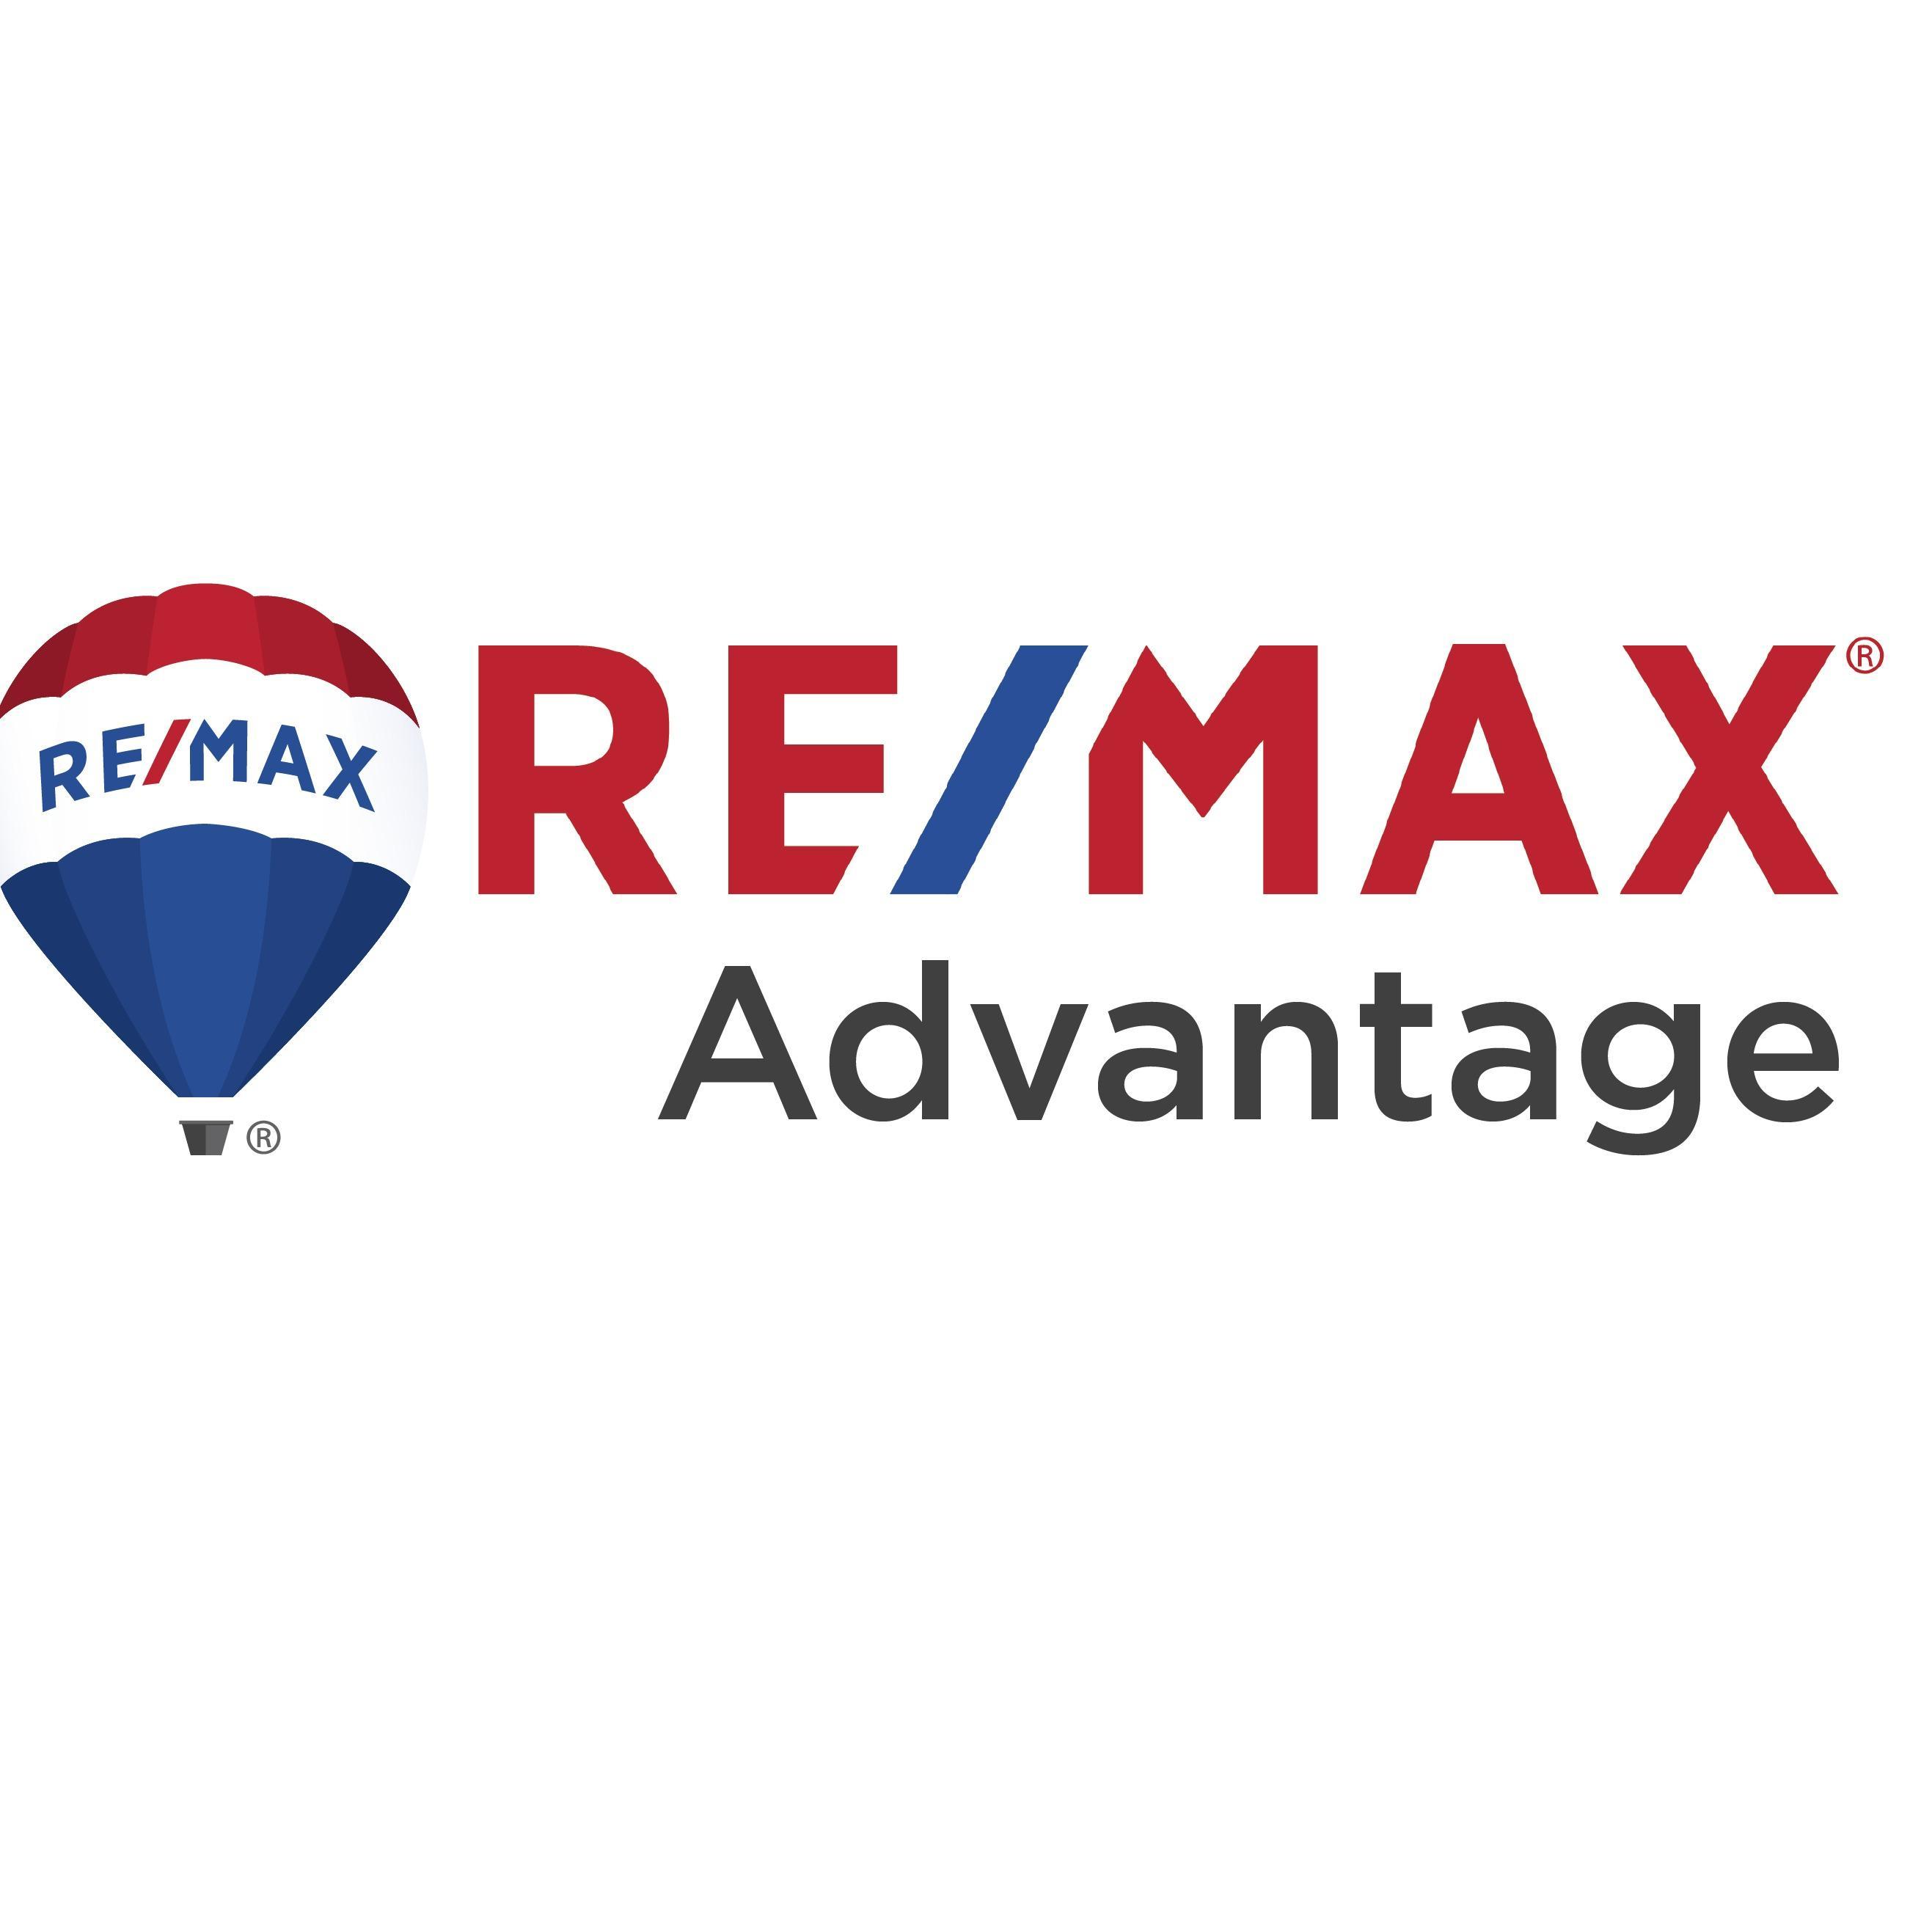 Nick Bowler | Re/Max Advantage - Chelan, WA 98816 - (509)699-9498 | ShowMeLocal.com